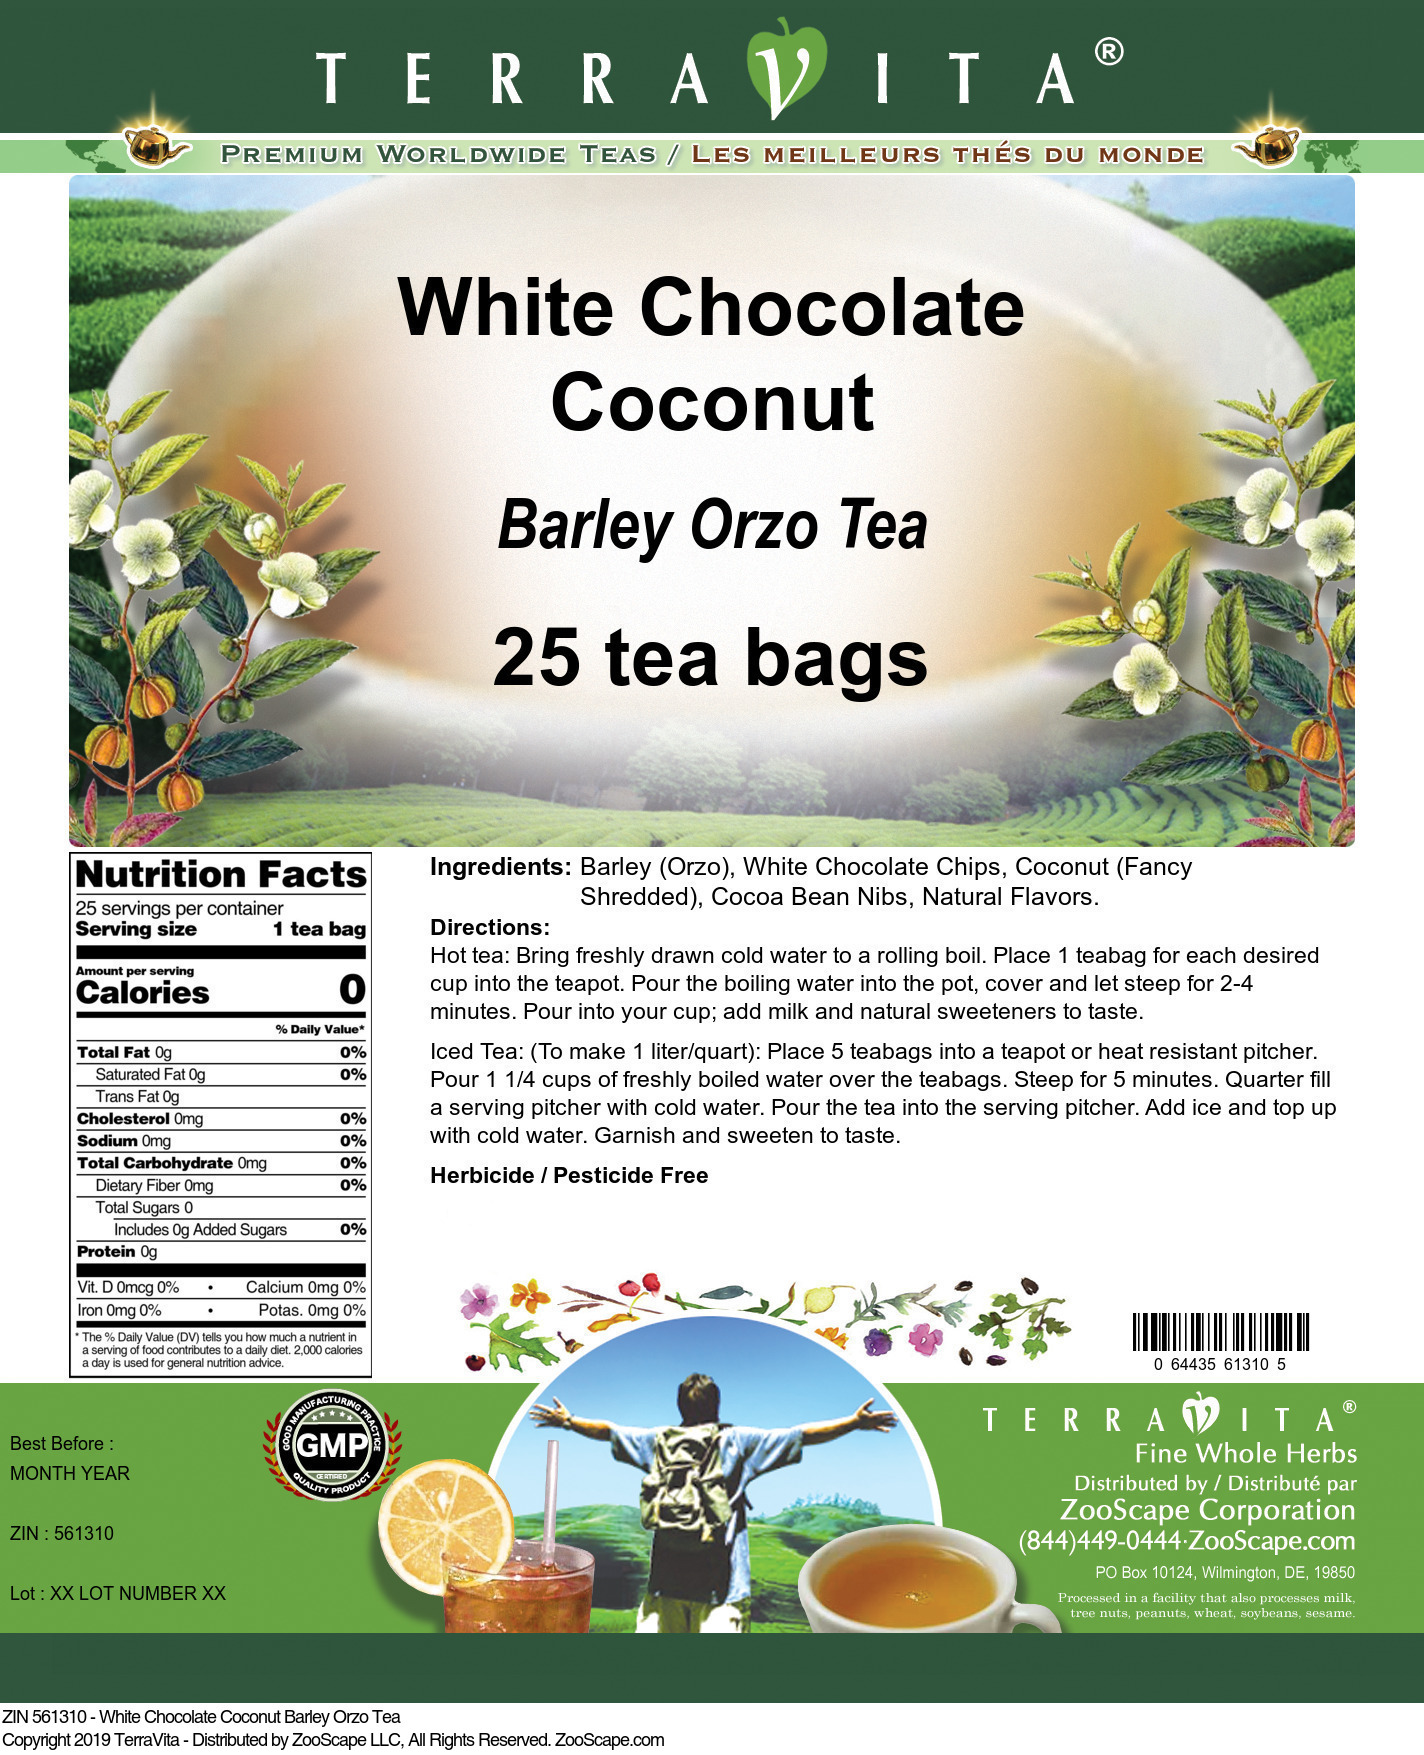 White Chocolate Coconut Barley Orzo Tea